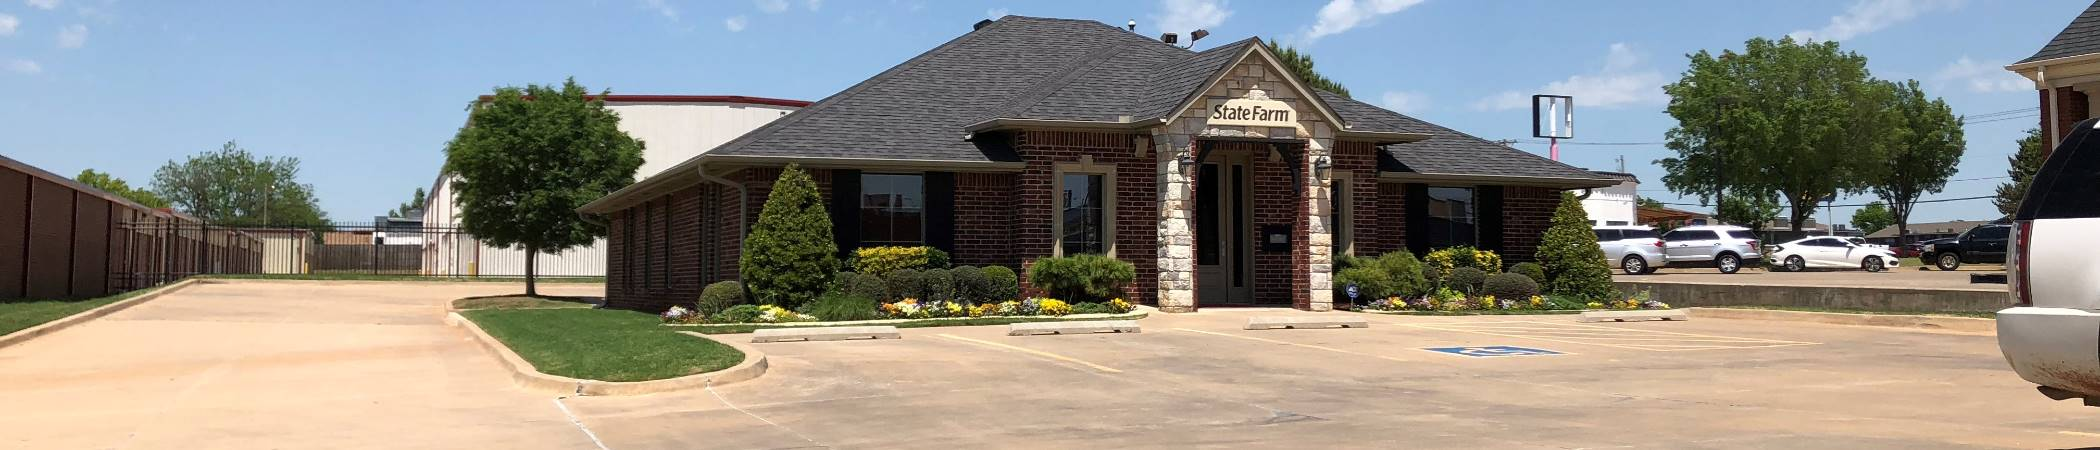 Rod Chew State Farm Insurance in Oklahoma City, OK | Home, Auto Insurance & more